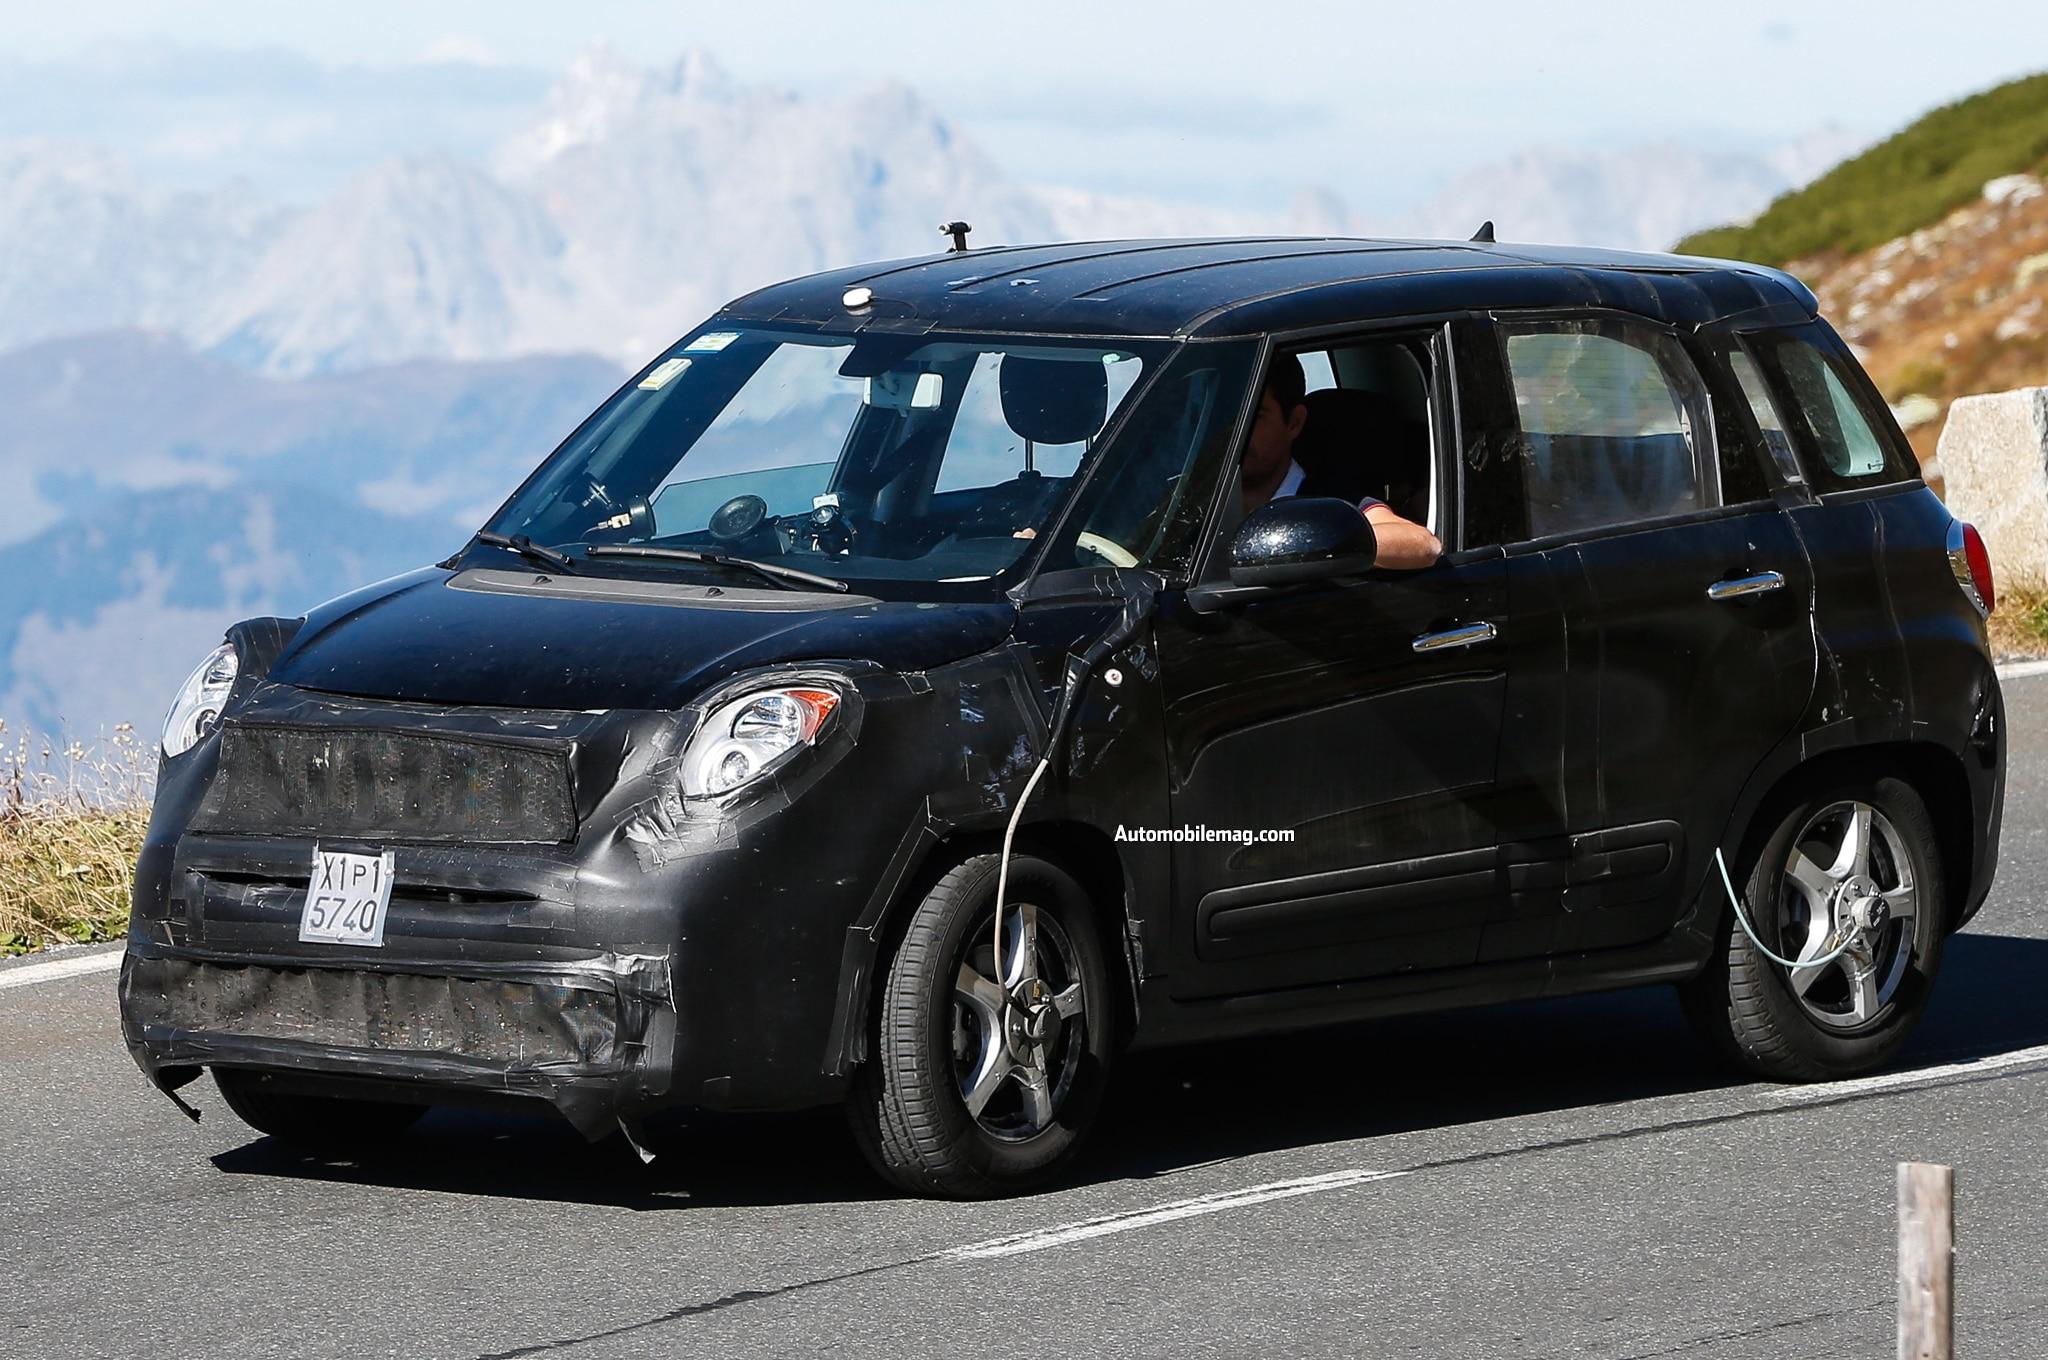 2015 Fiat 500X Spied Front Three Quarter 11